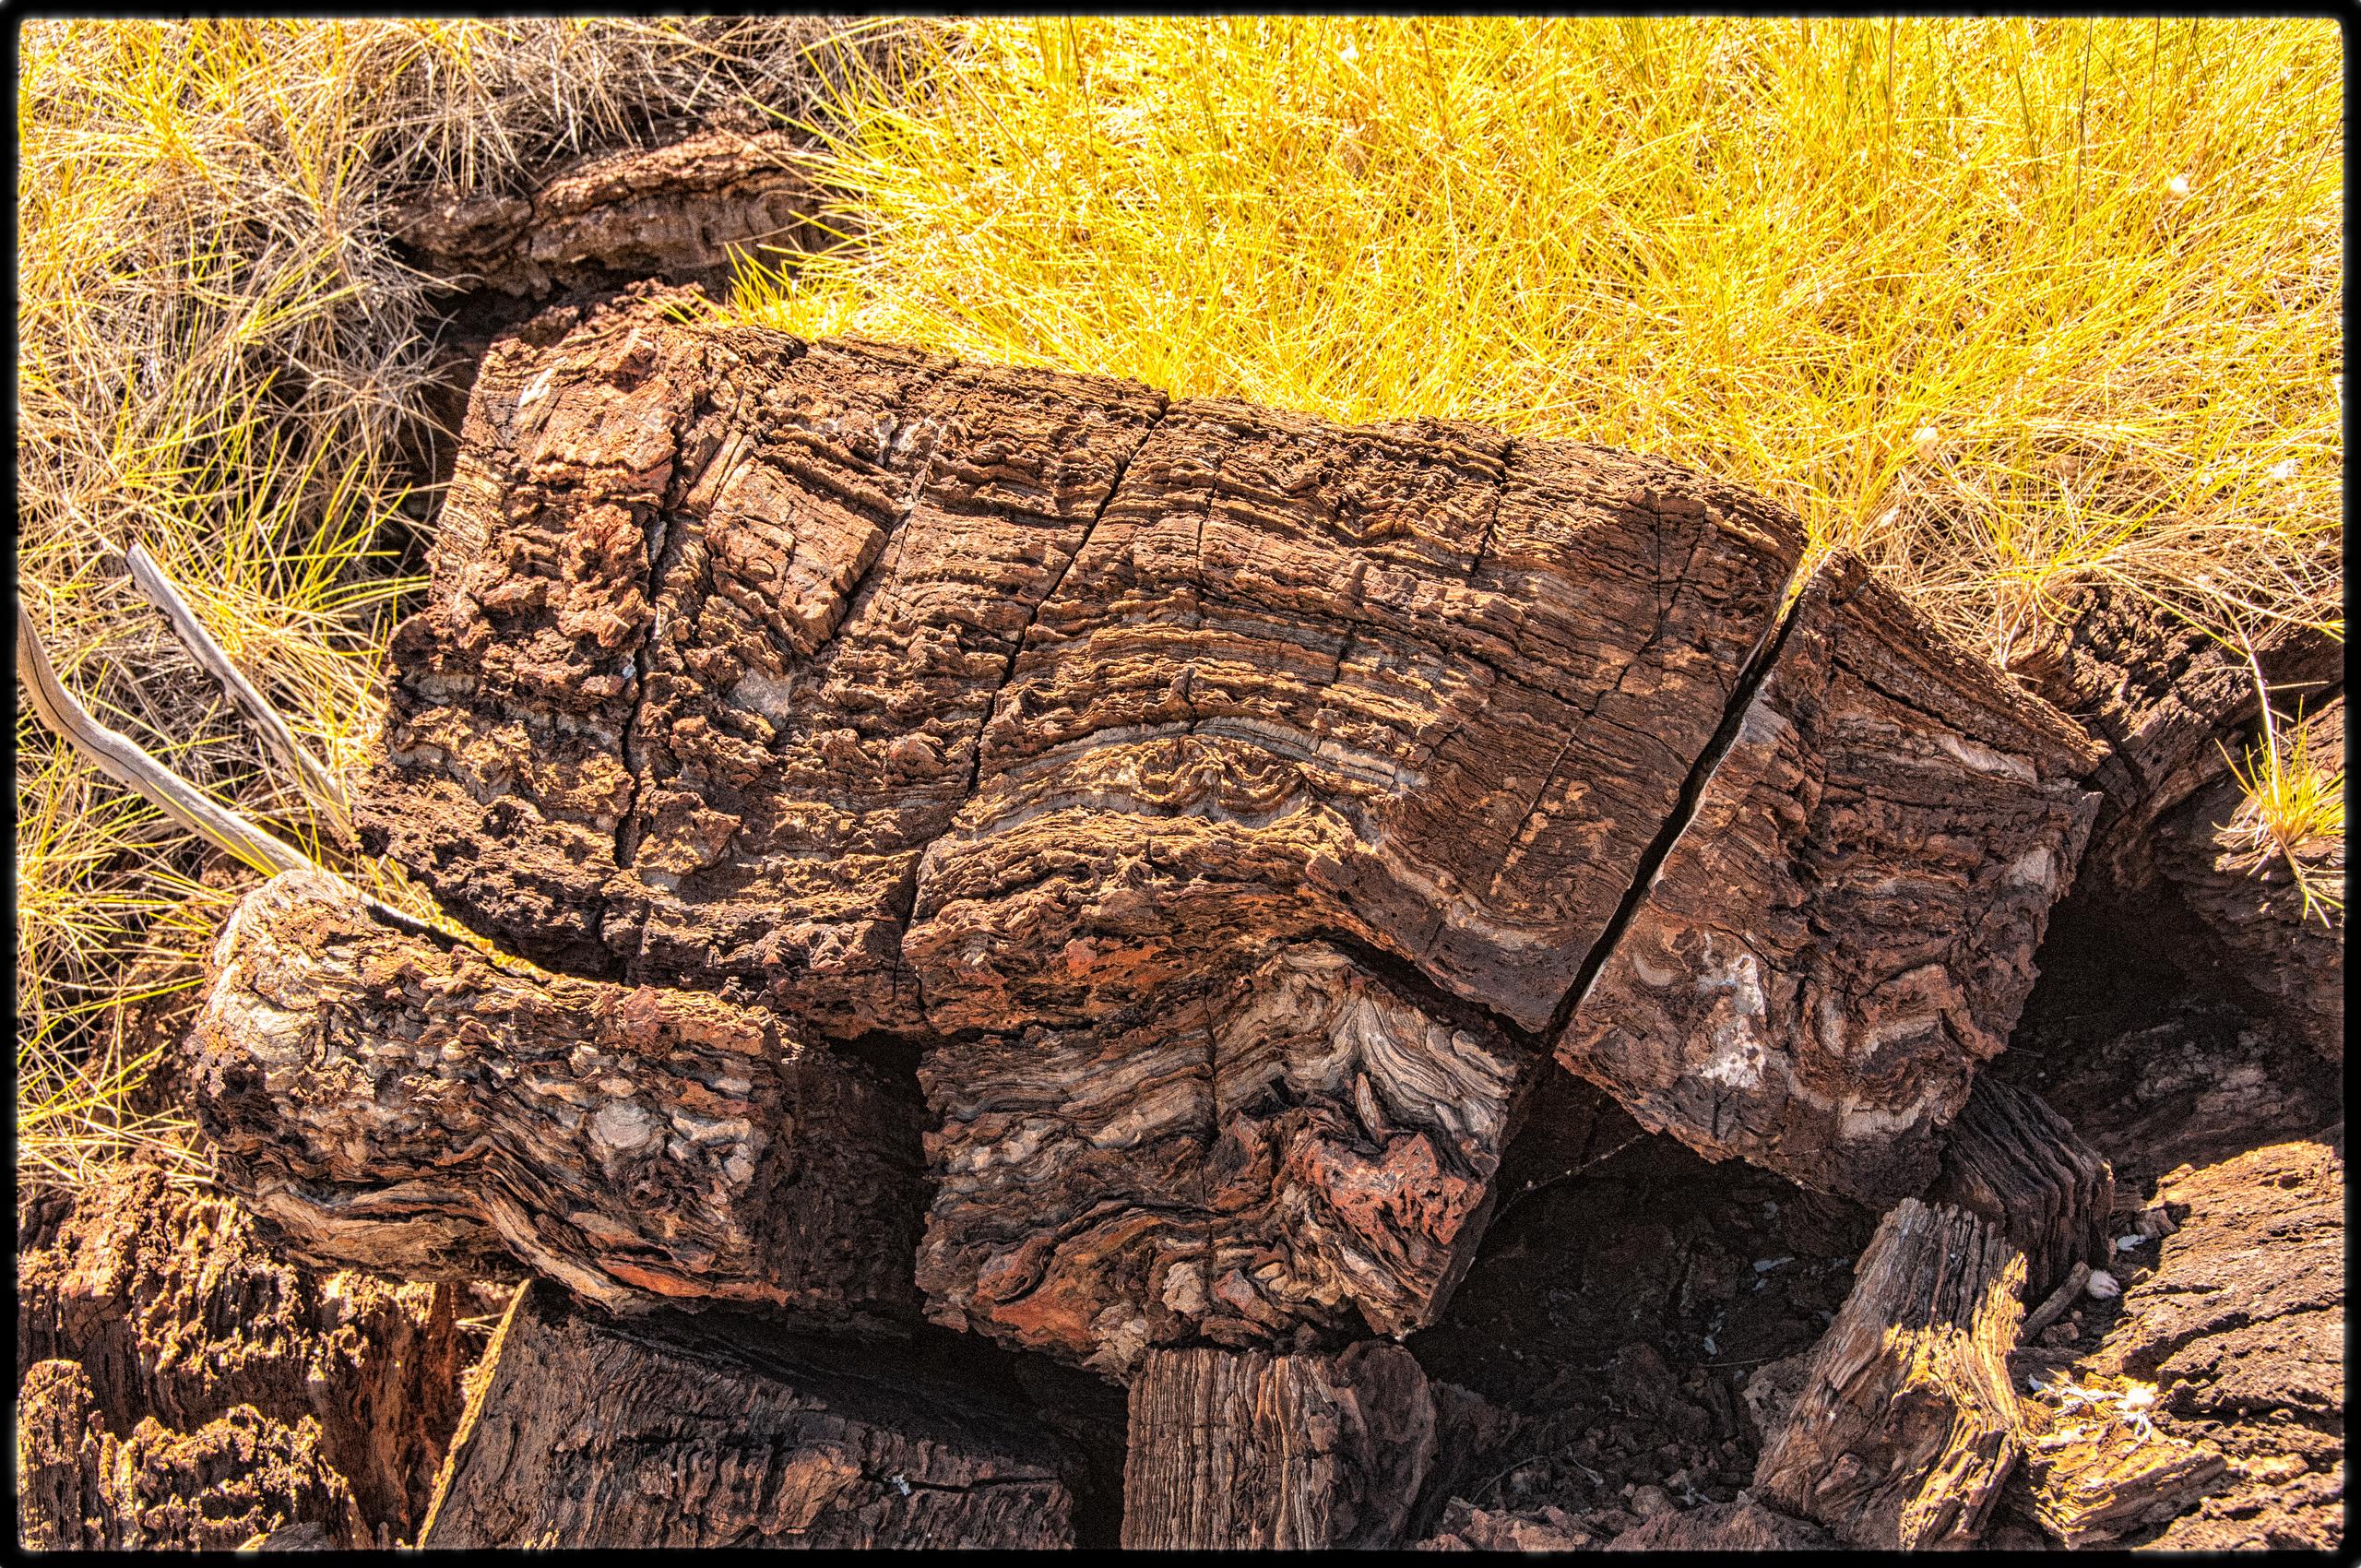 Stromatolitic limestone